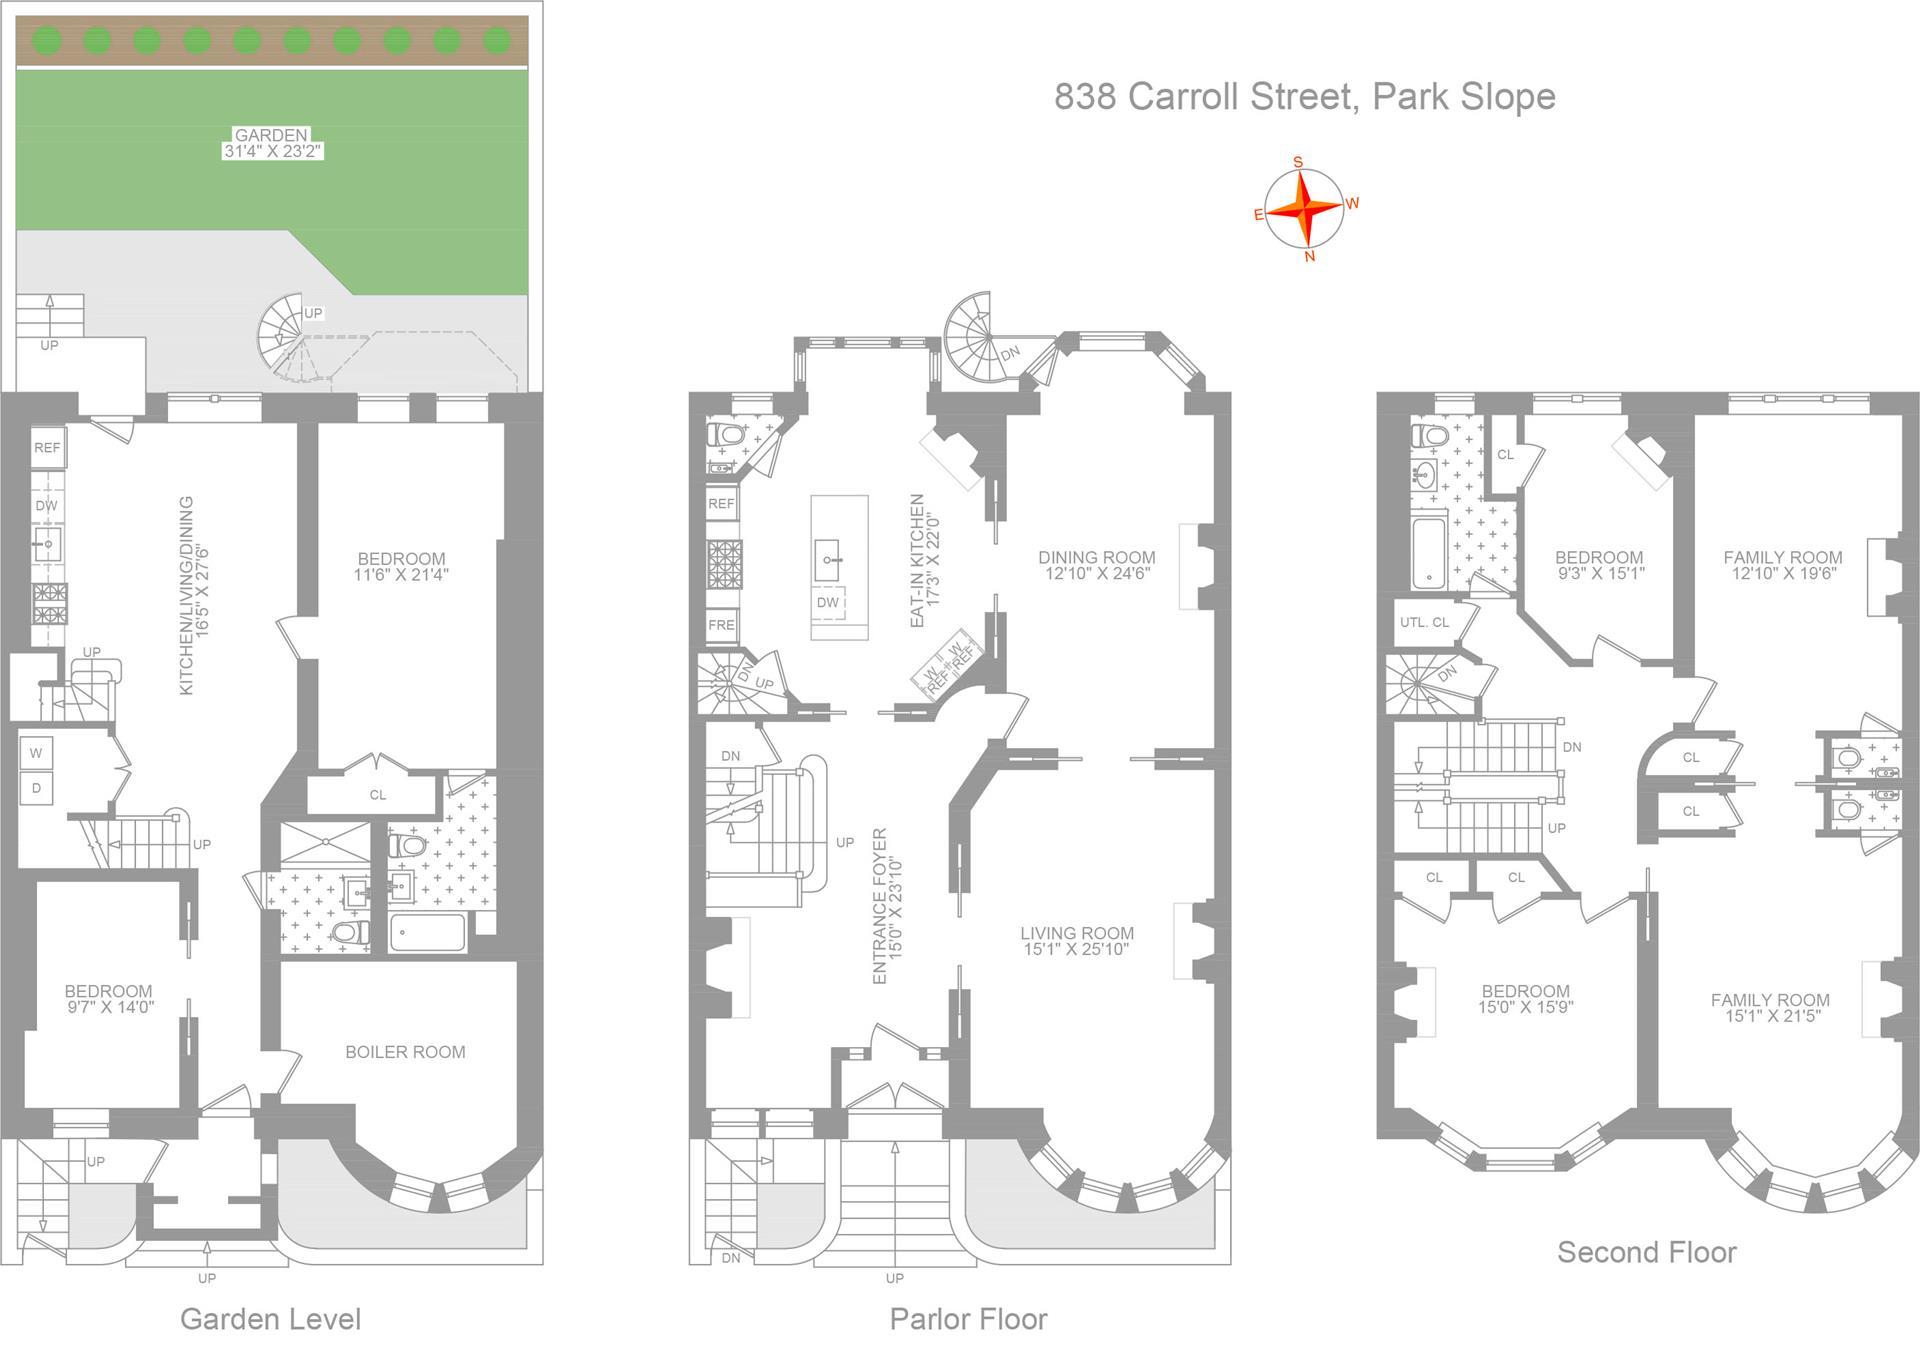 Floor plan of 838 Carroll St - Park Slope, New York